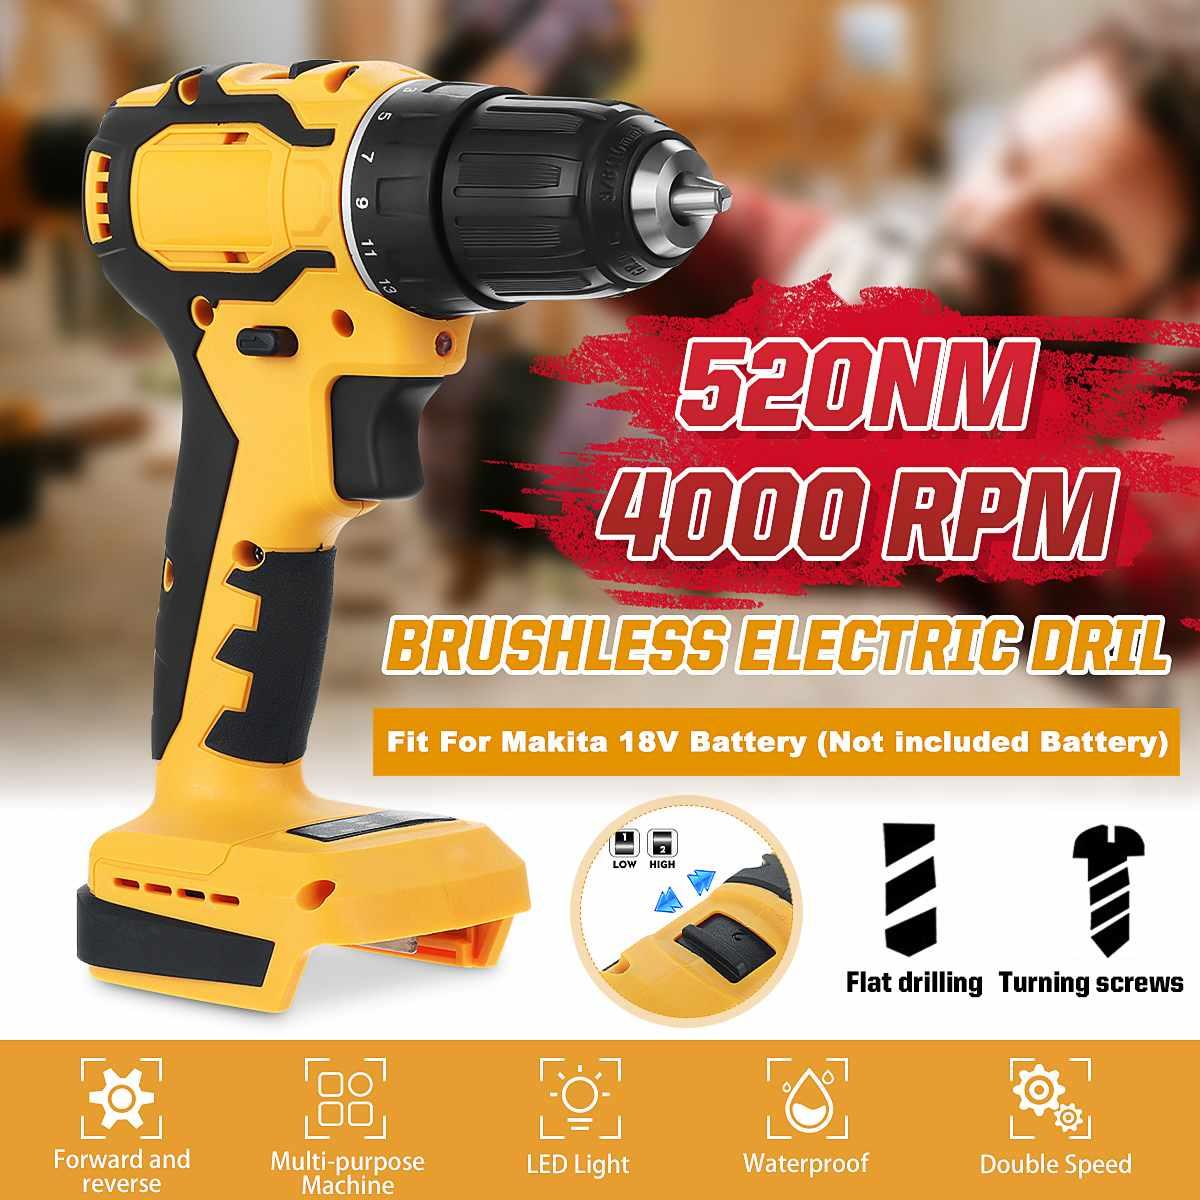 10mm Chuck Brushless Impact Drill 350N.m Cordless Electric Drill For Makita 18V Battery 4000RPM LED Light Household Power Drills